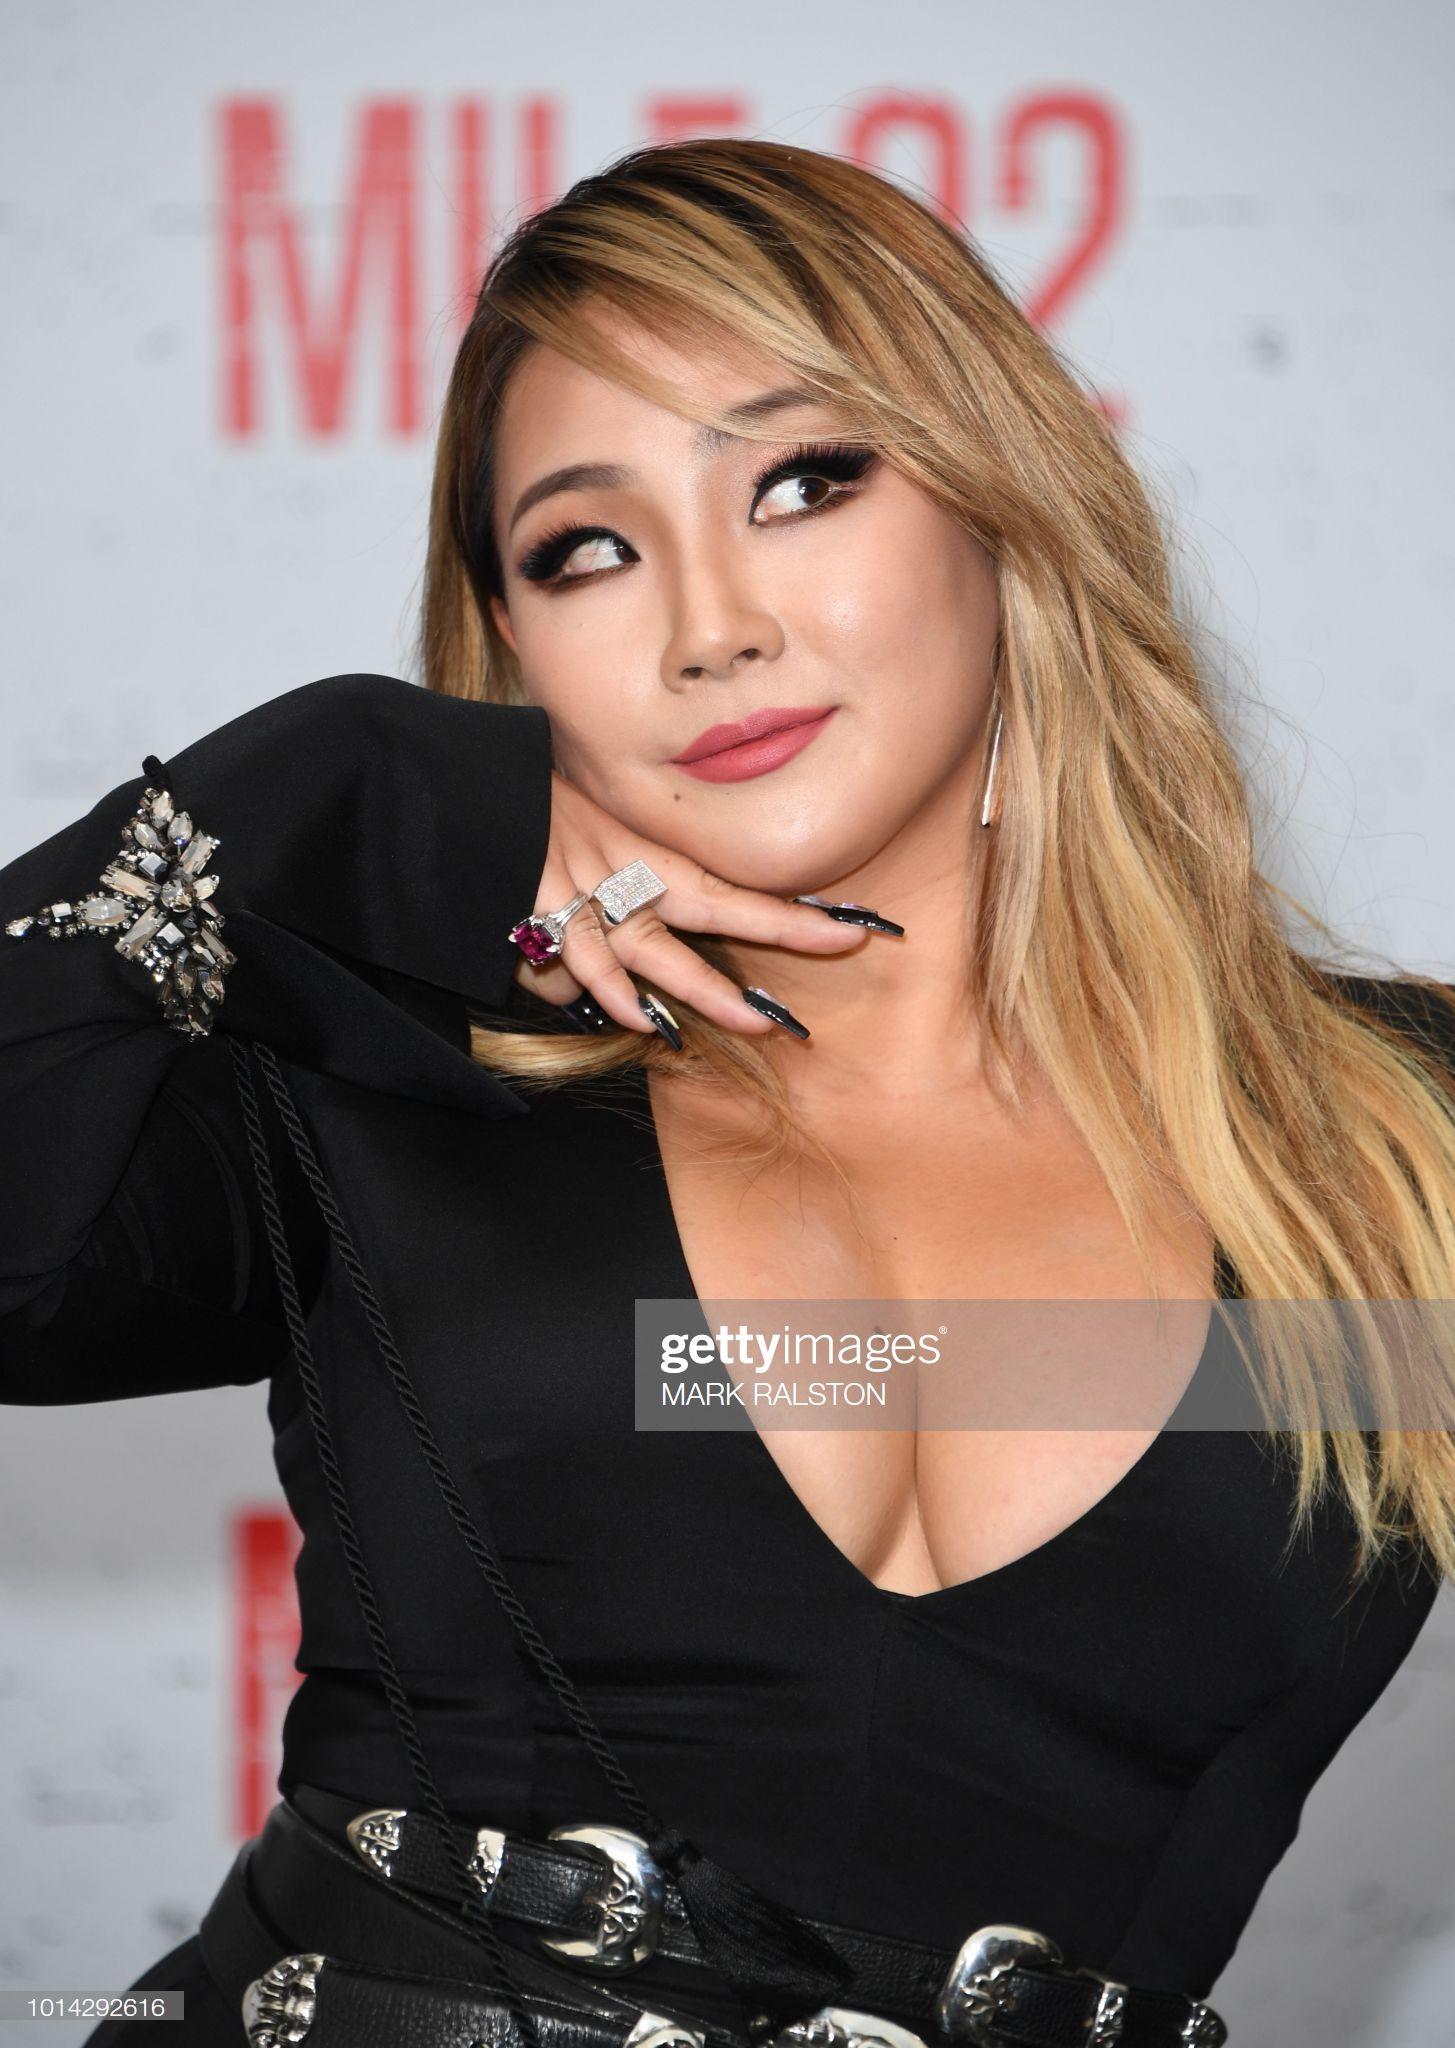 Lee Chae Rin Aka Cl Blonde Asian Amazing Women Pretty People